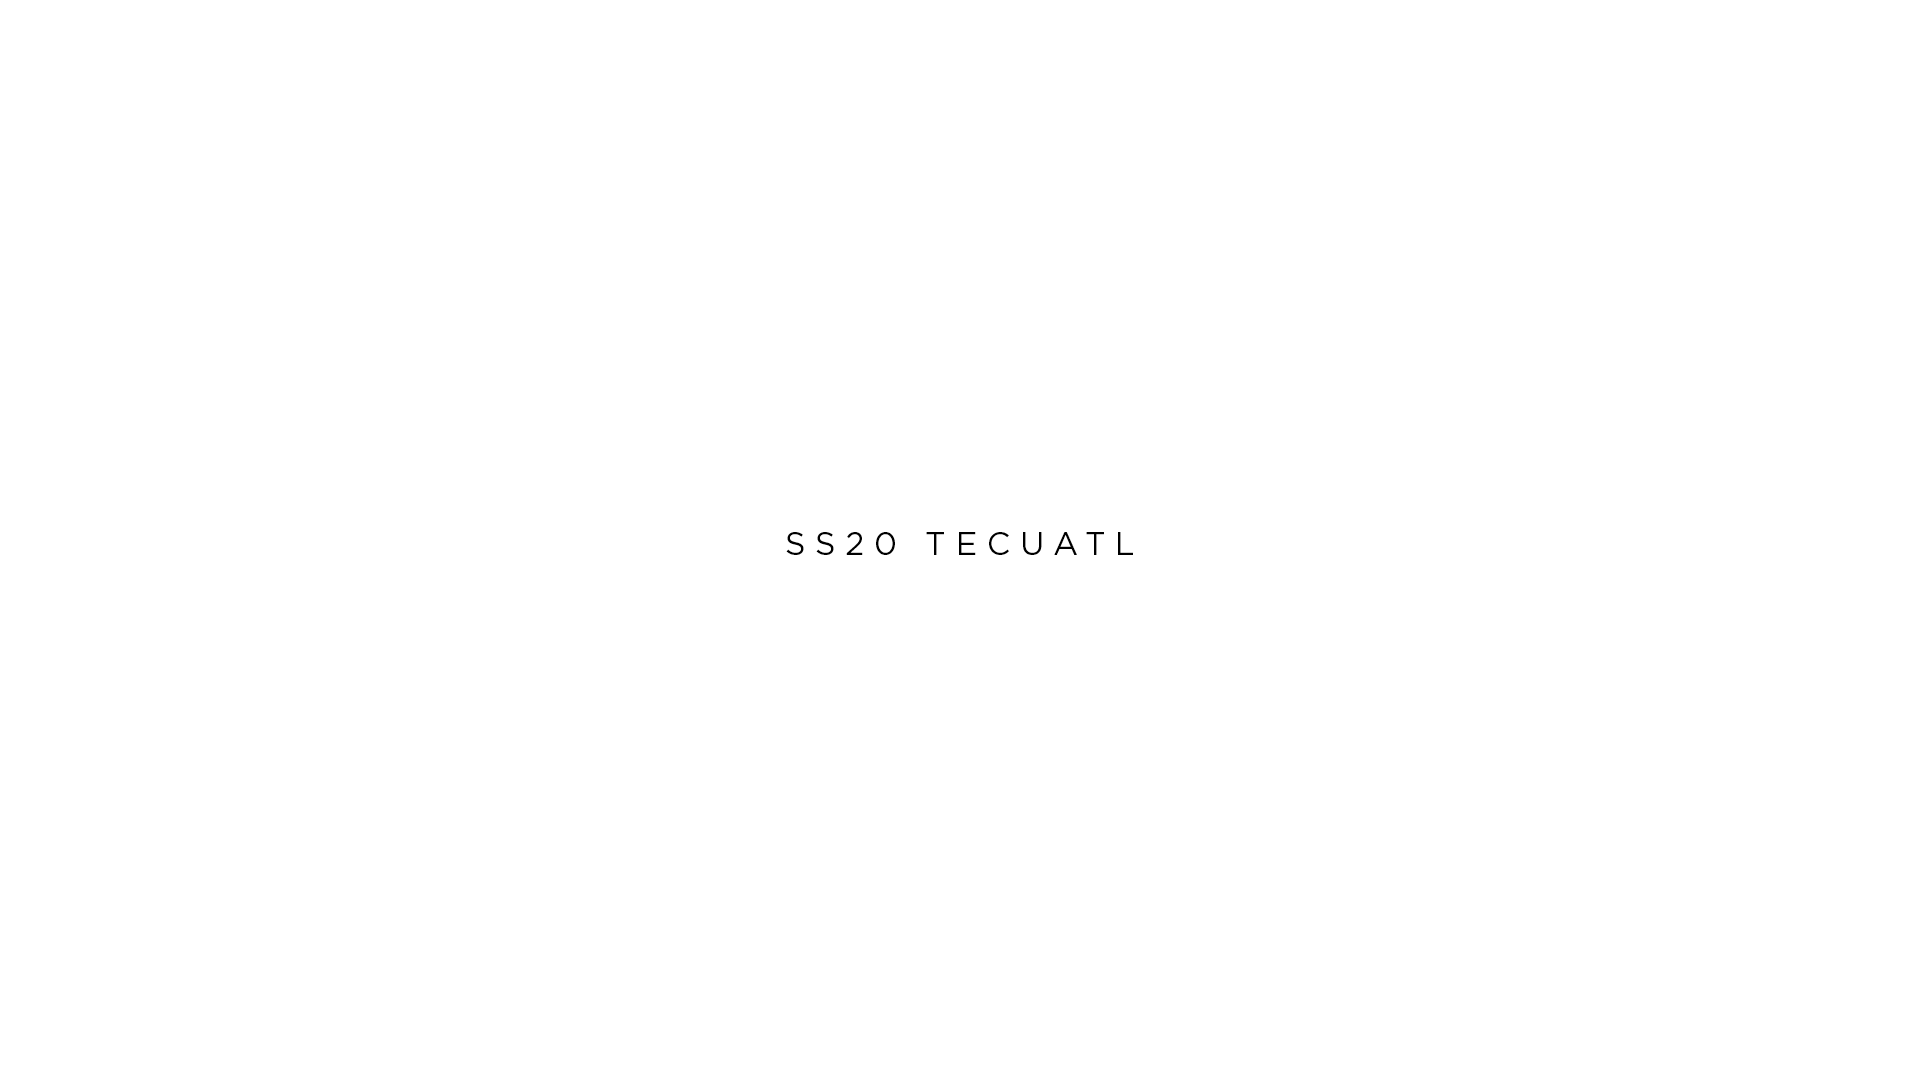 Ss20 tecuatl